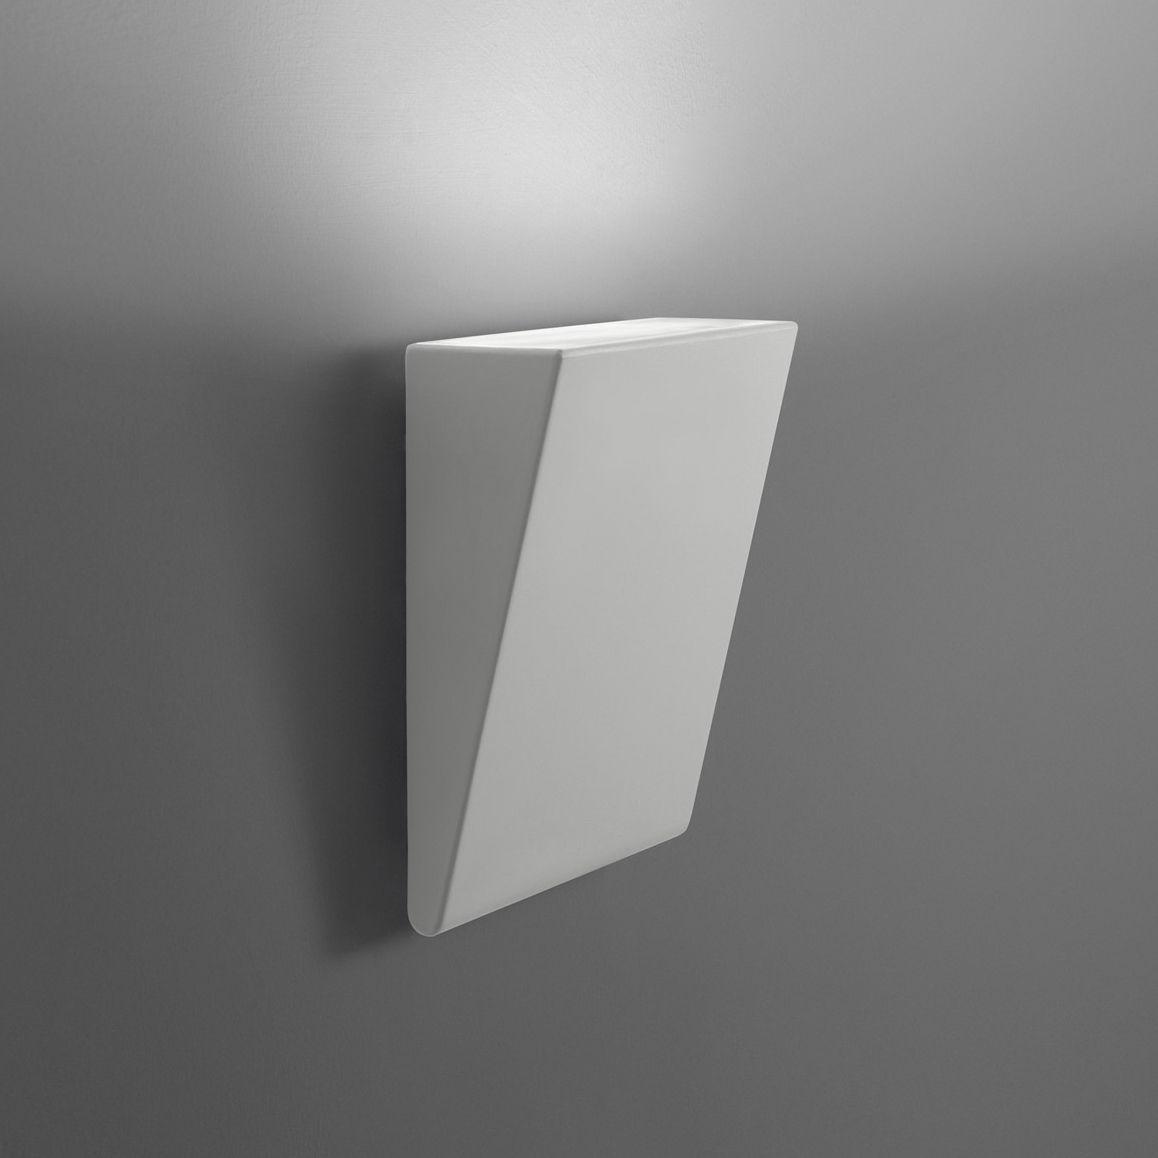 Scopri applique cuneo lampada da terra per esterni alluminio di artemide made in design - Lampade da parete di design ...